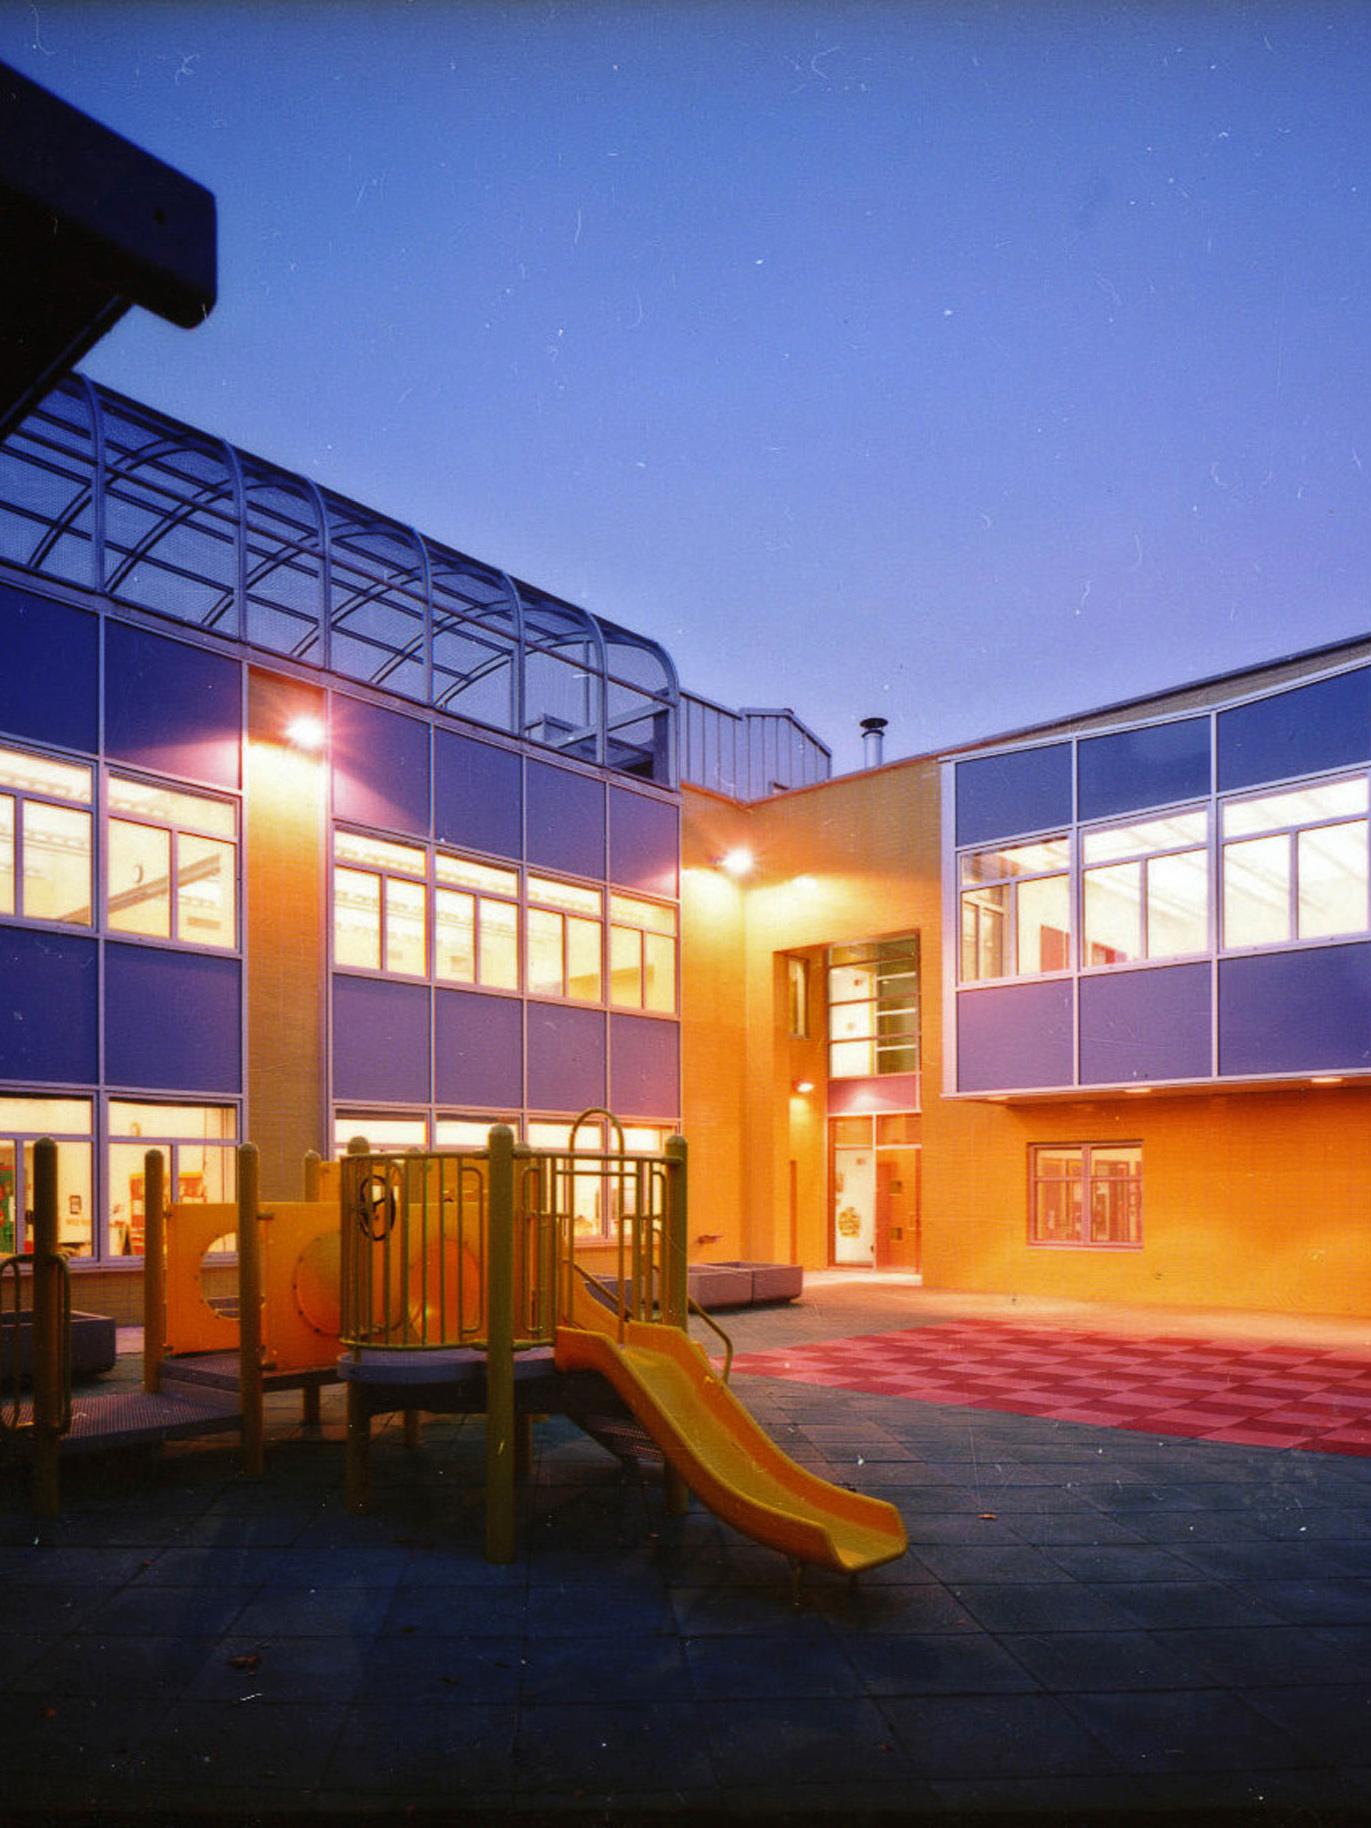 Hollis Child Care Center